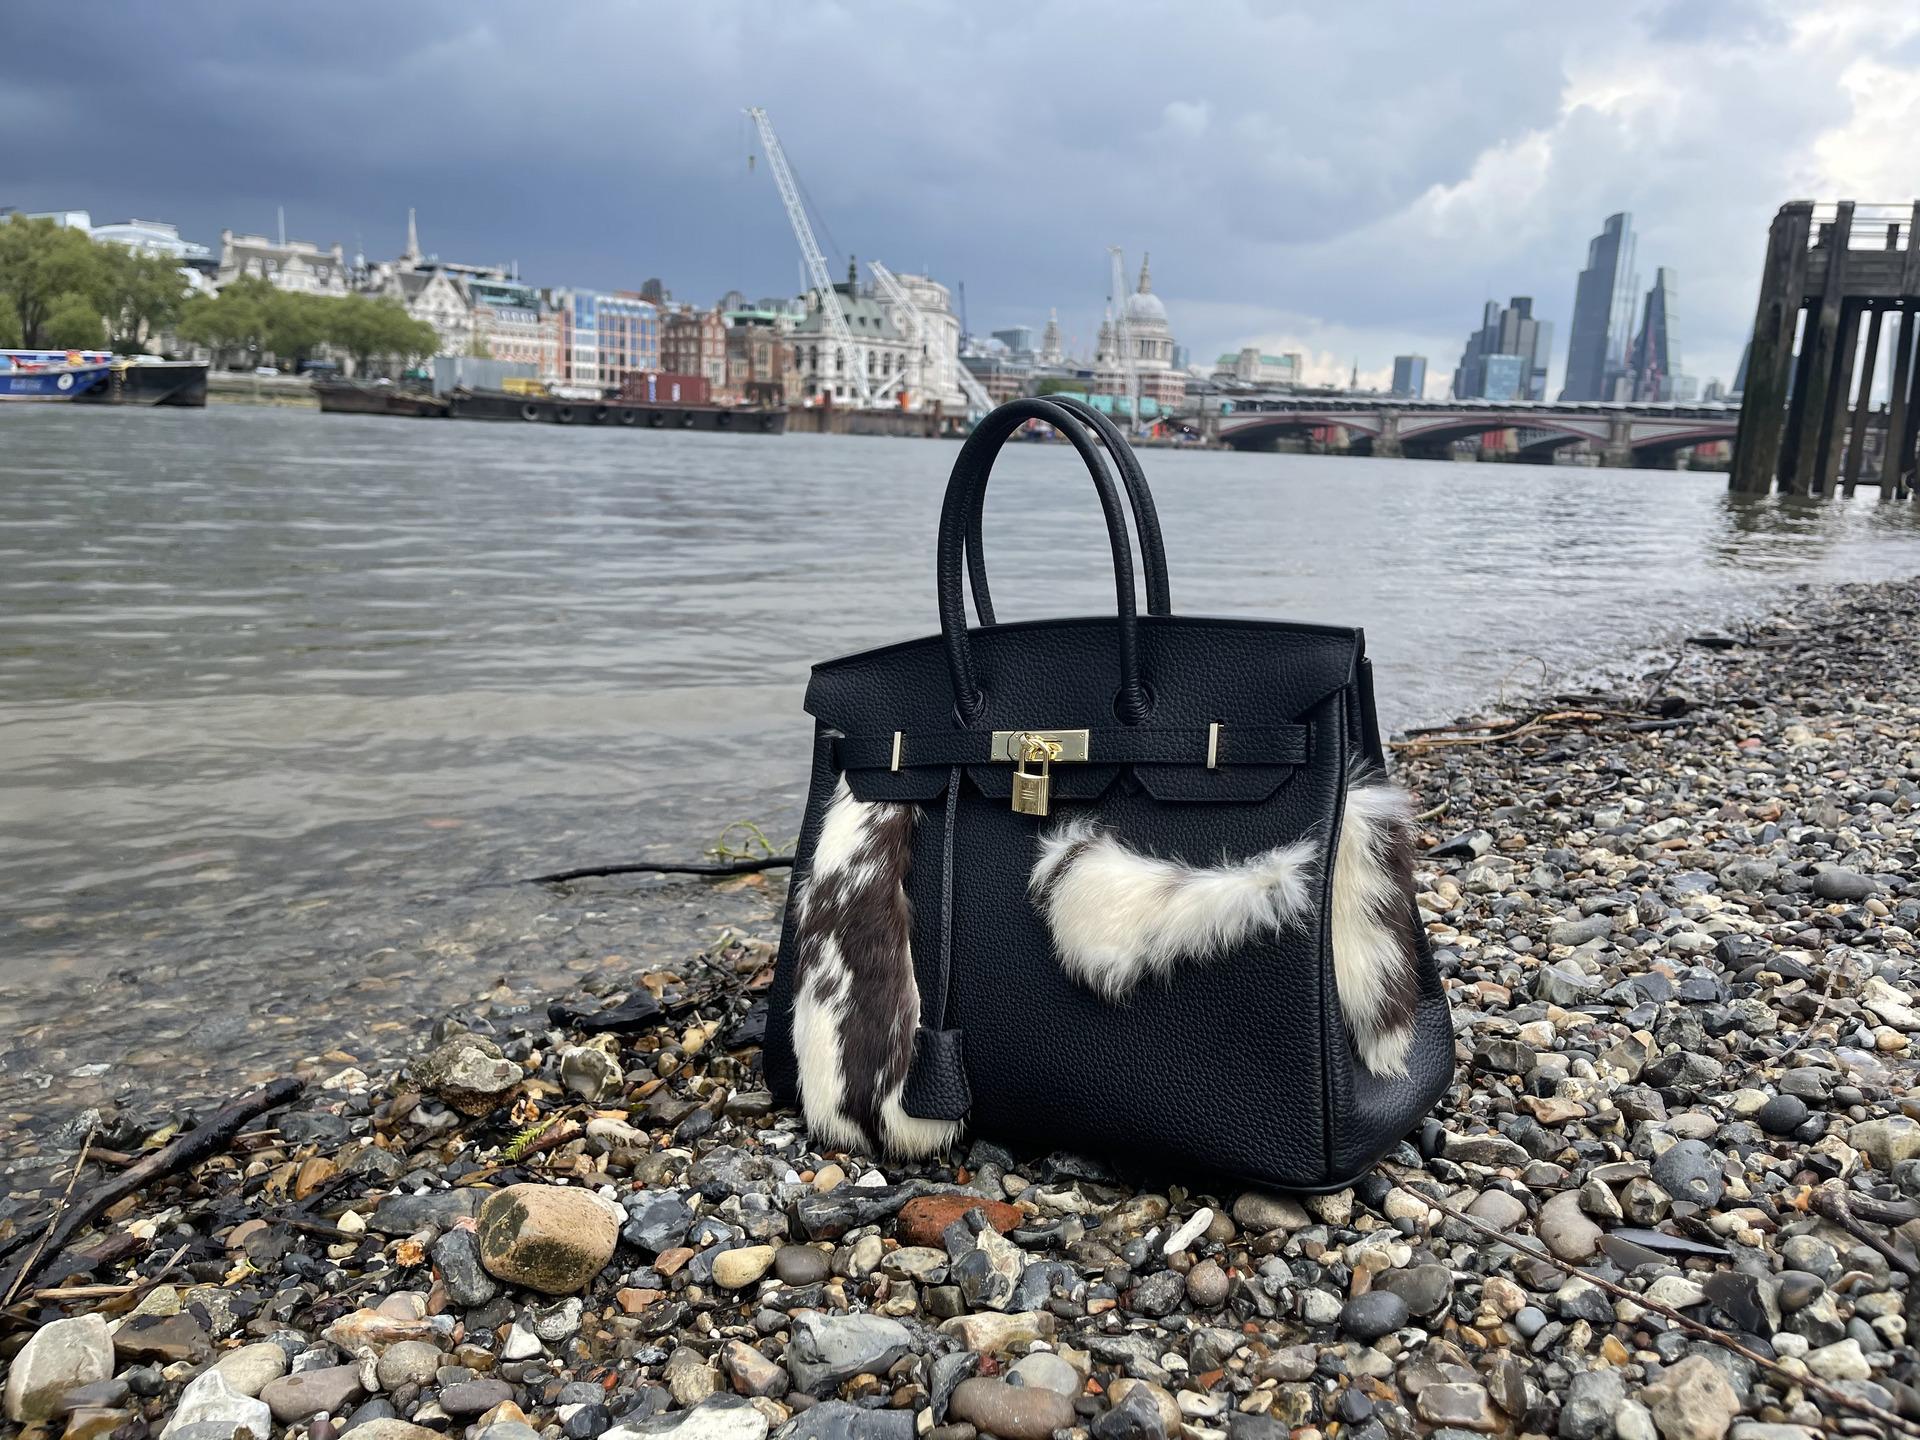 Gruff on Thames